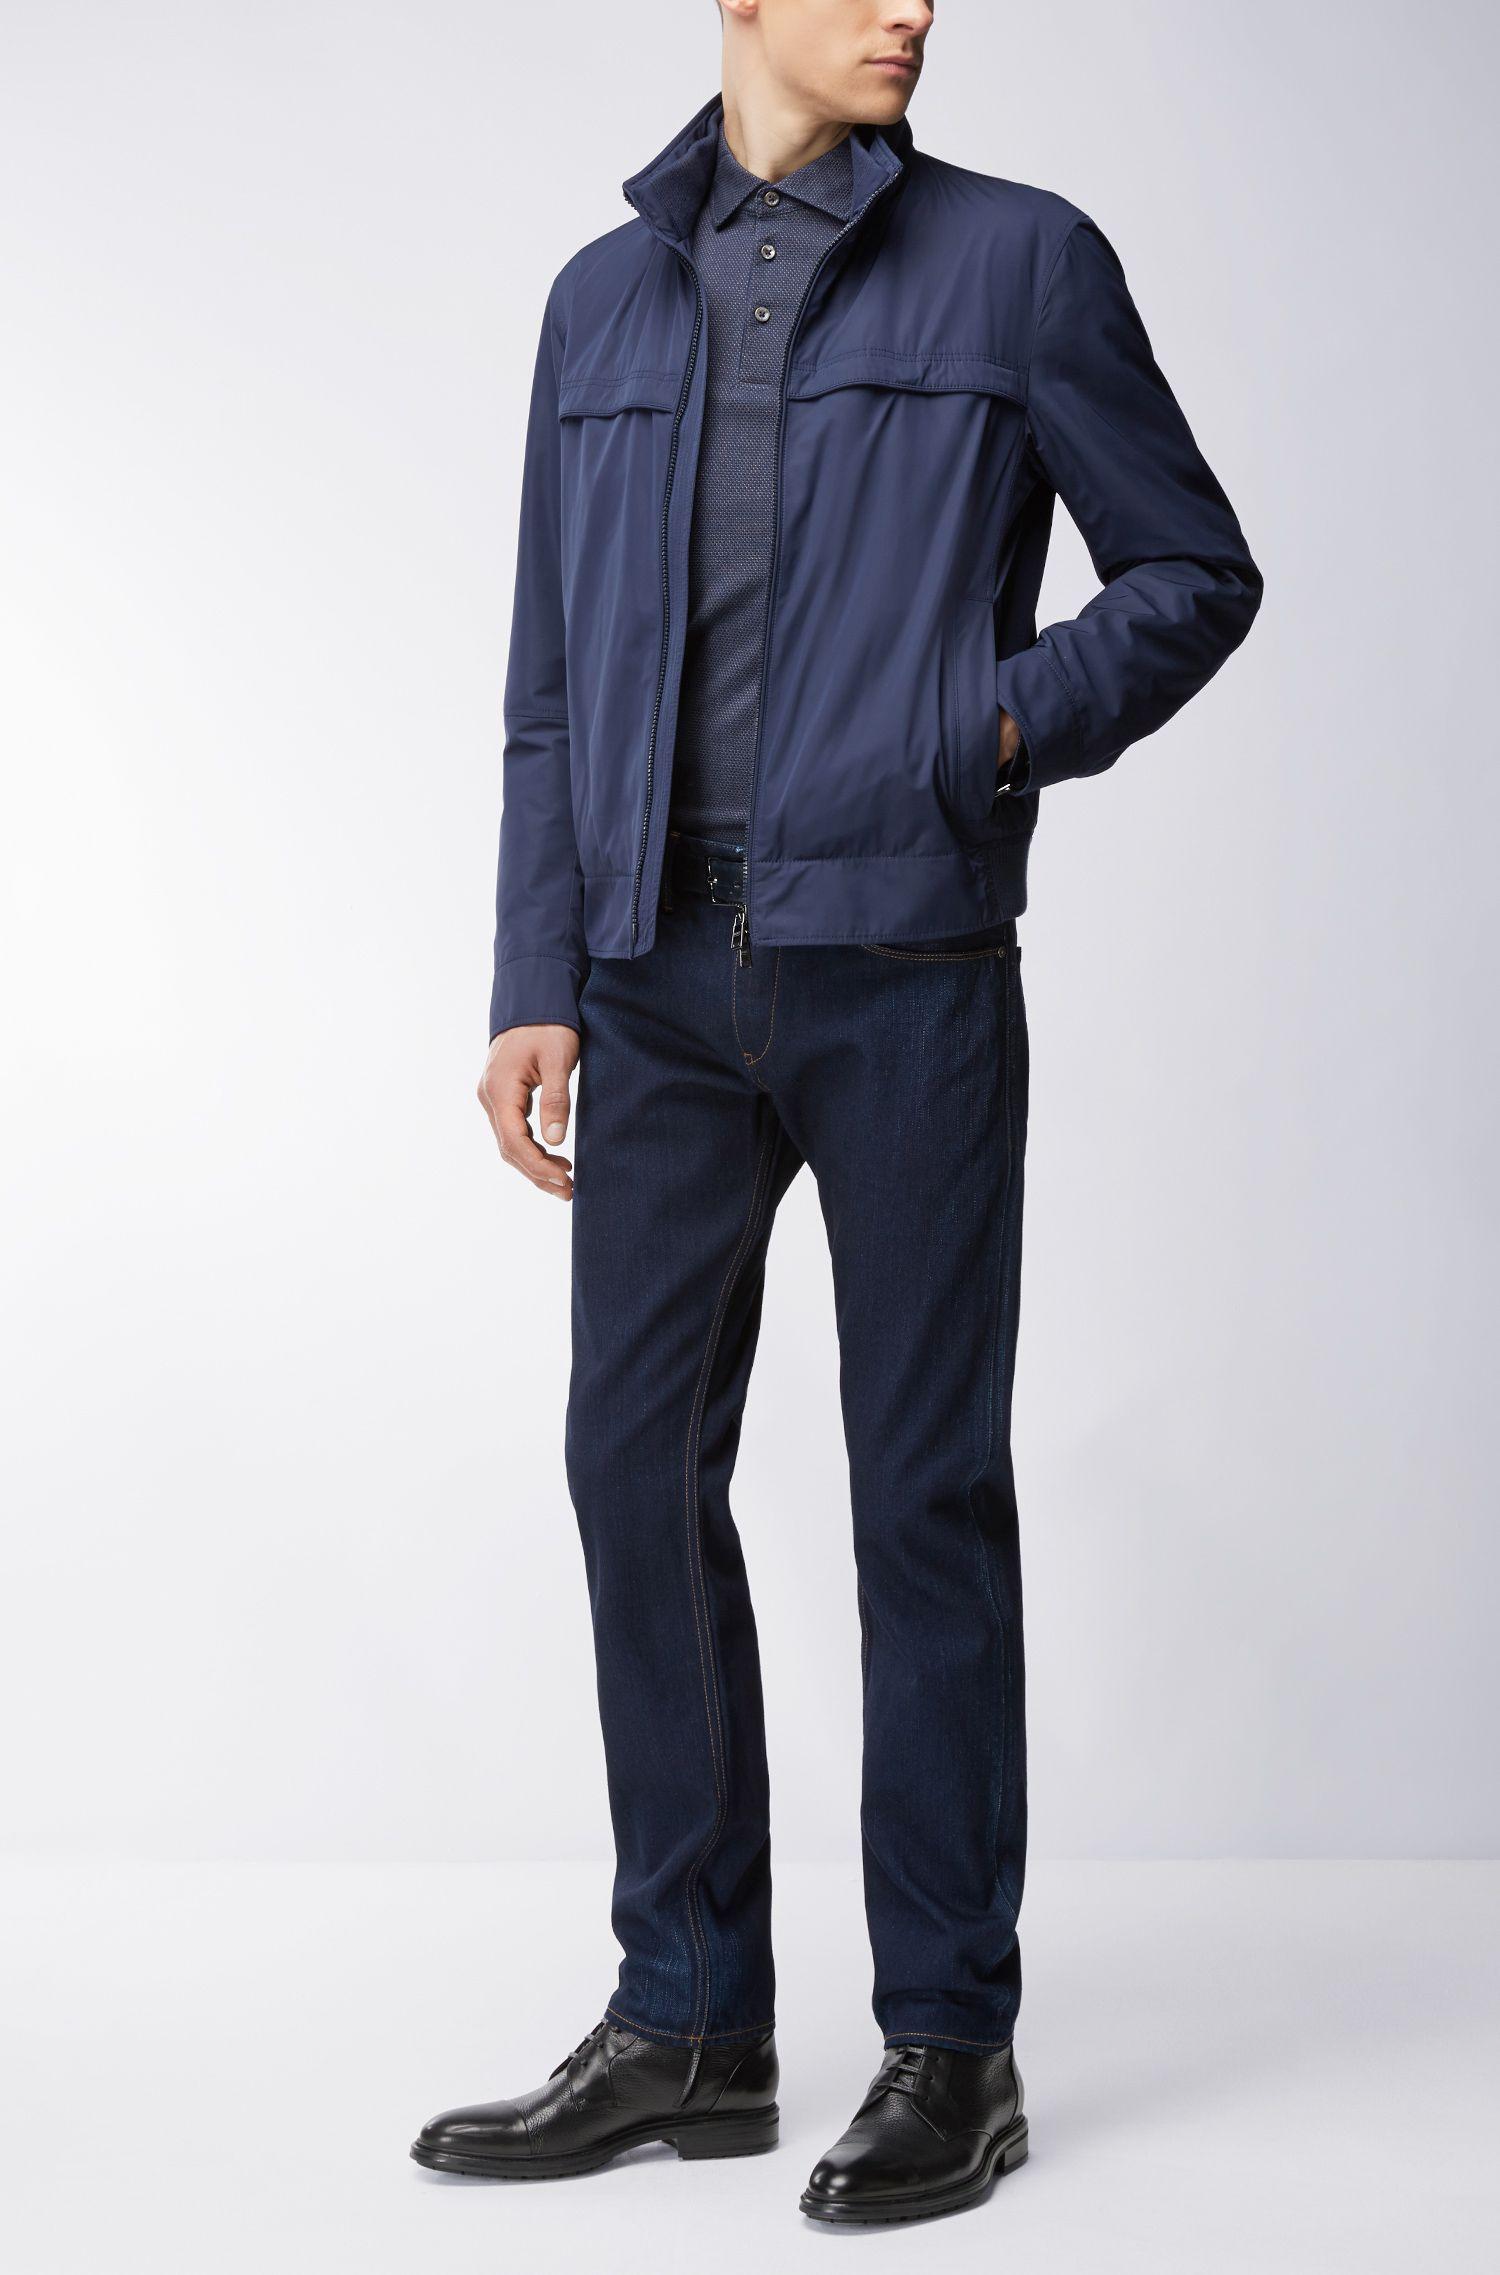 Jacquard Cotton Polo Shirt, Slim Fit | Paver